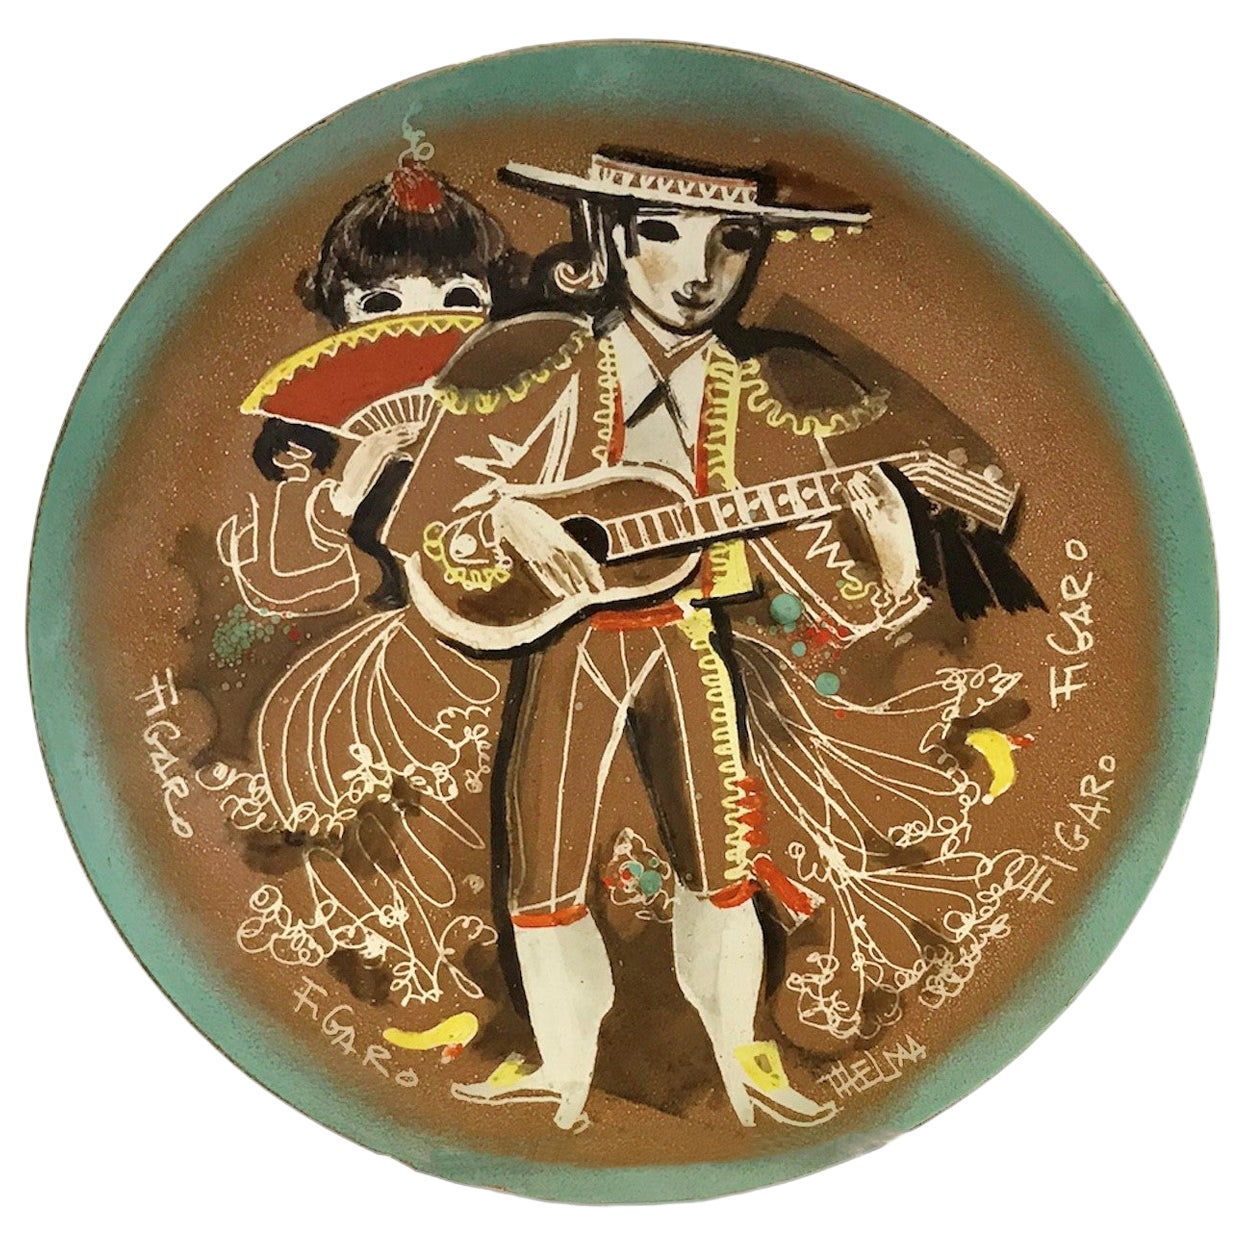 Thelma Winter Mid-Century Modern Copper Enamel Plate of Figaro Met Opera, NYC